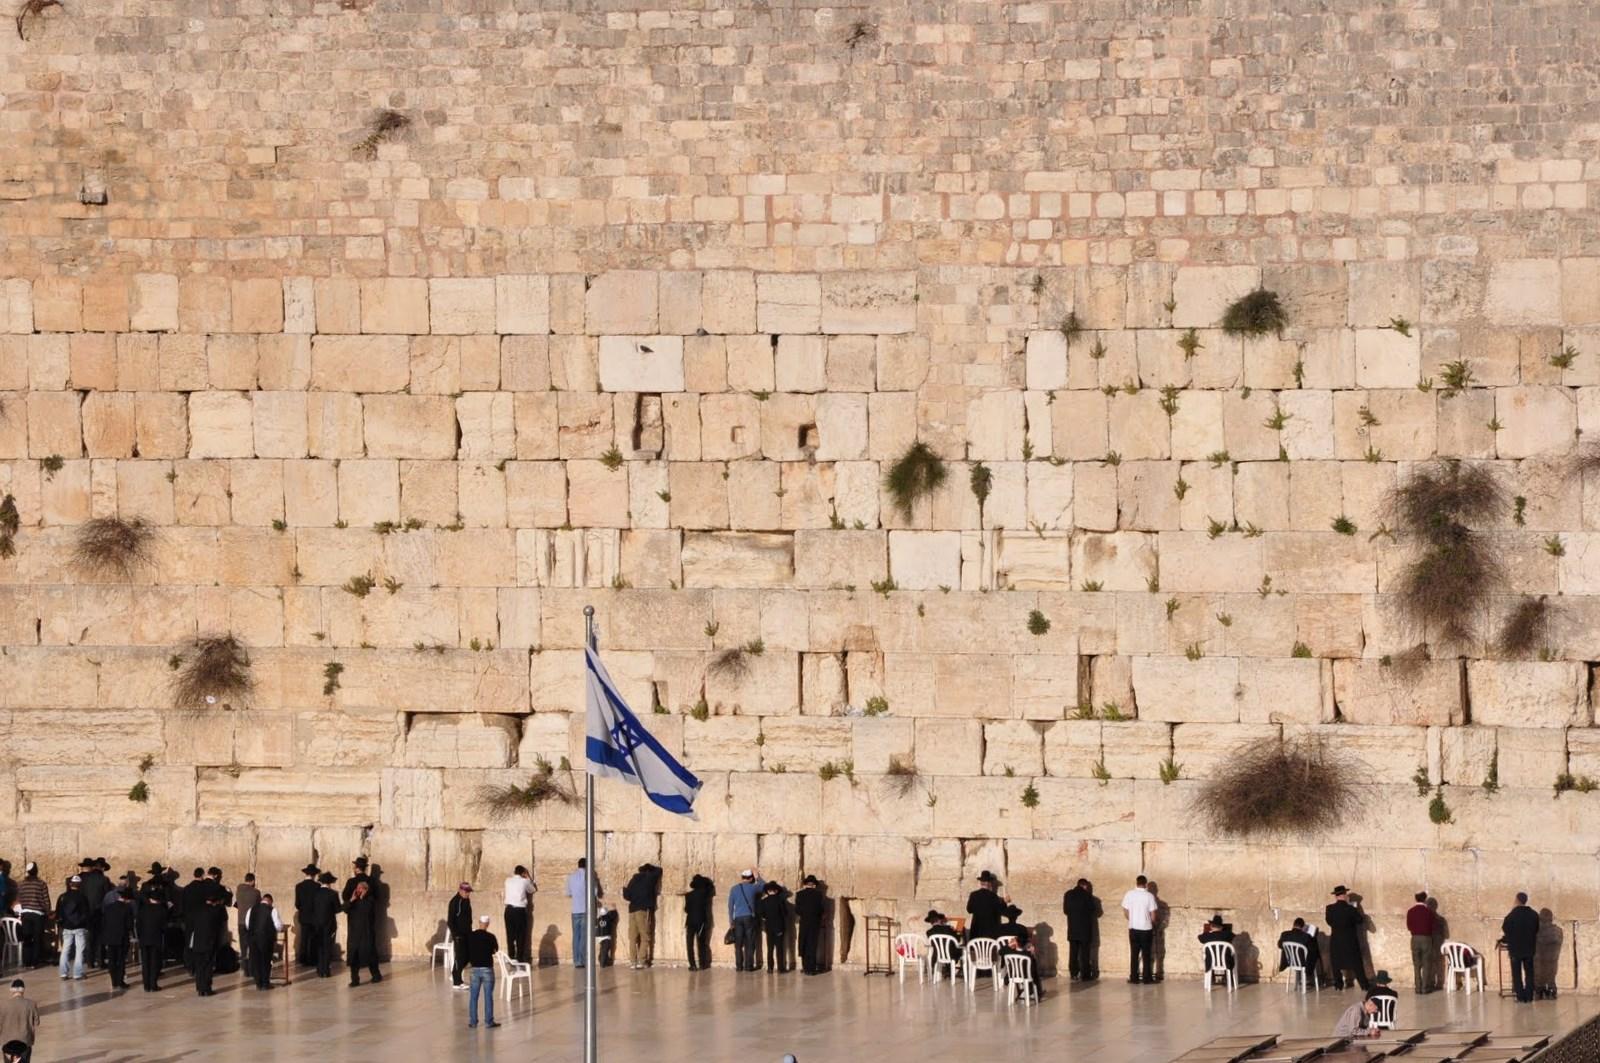 Yom Hatzmaut: Israel comemora independência - Kotel - Muro das Lamentações (Foto: Daniela Feldman)